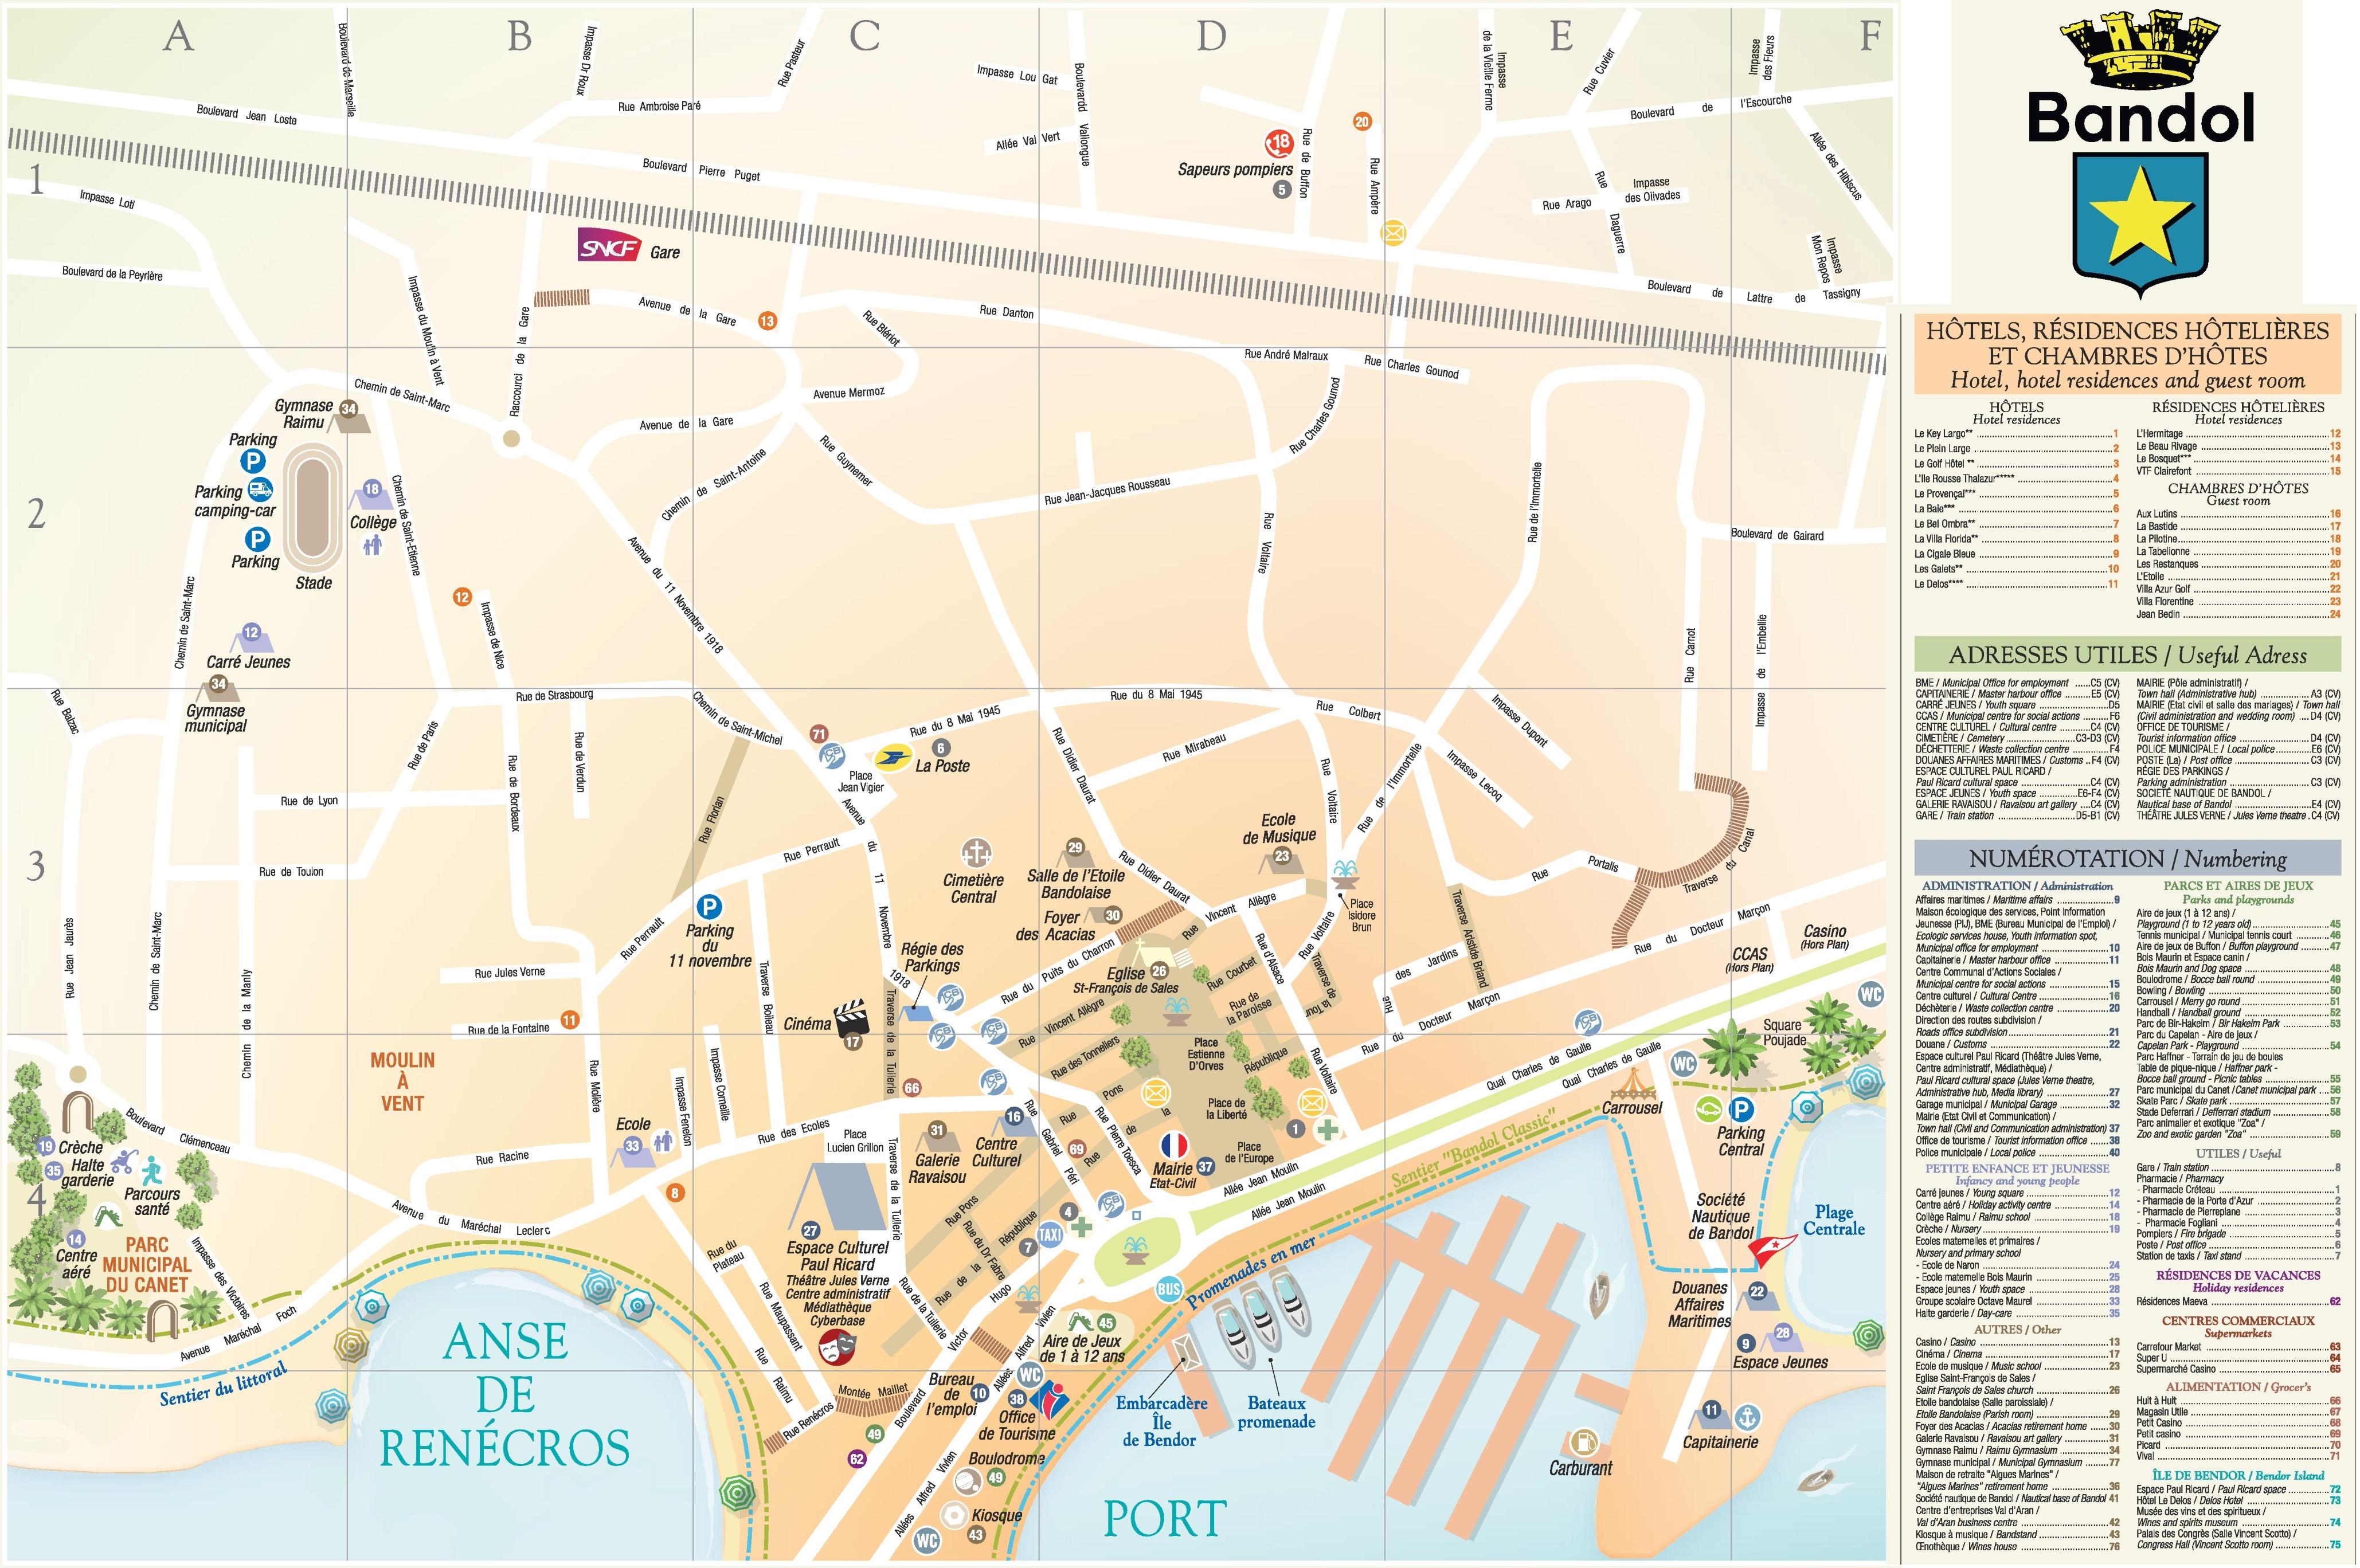 Bandol city center map